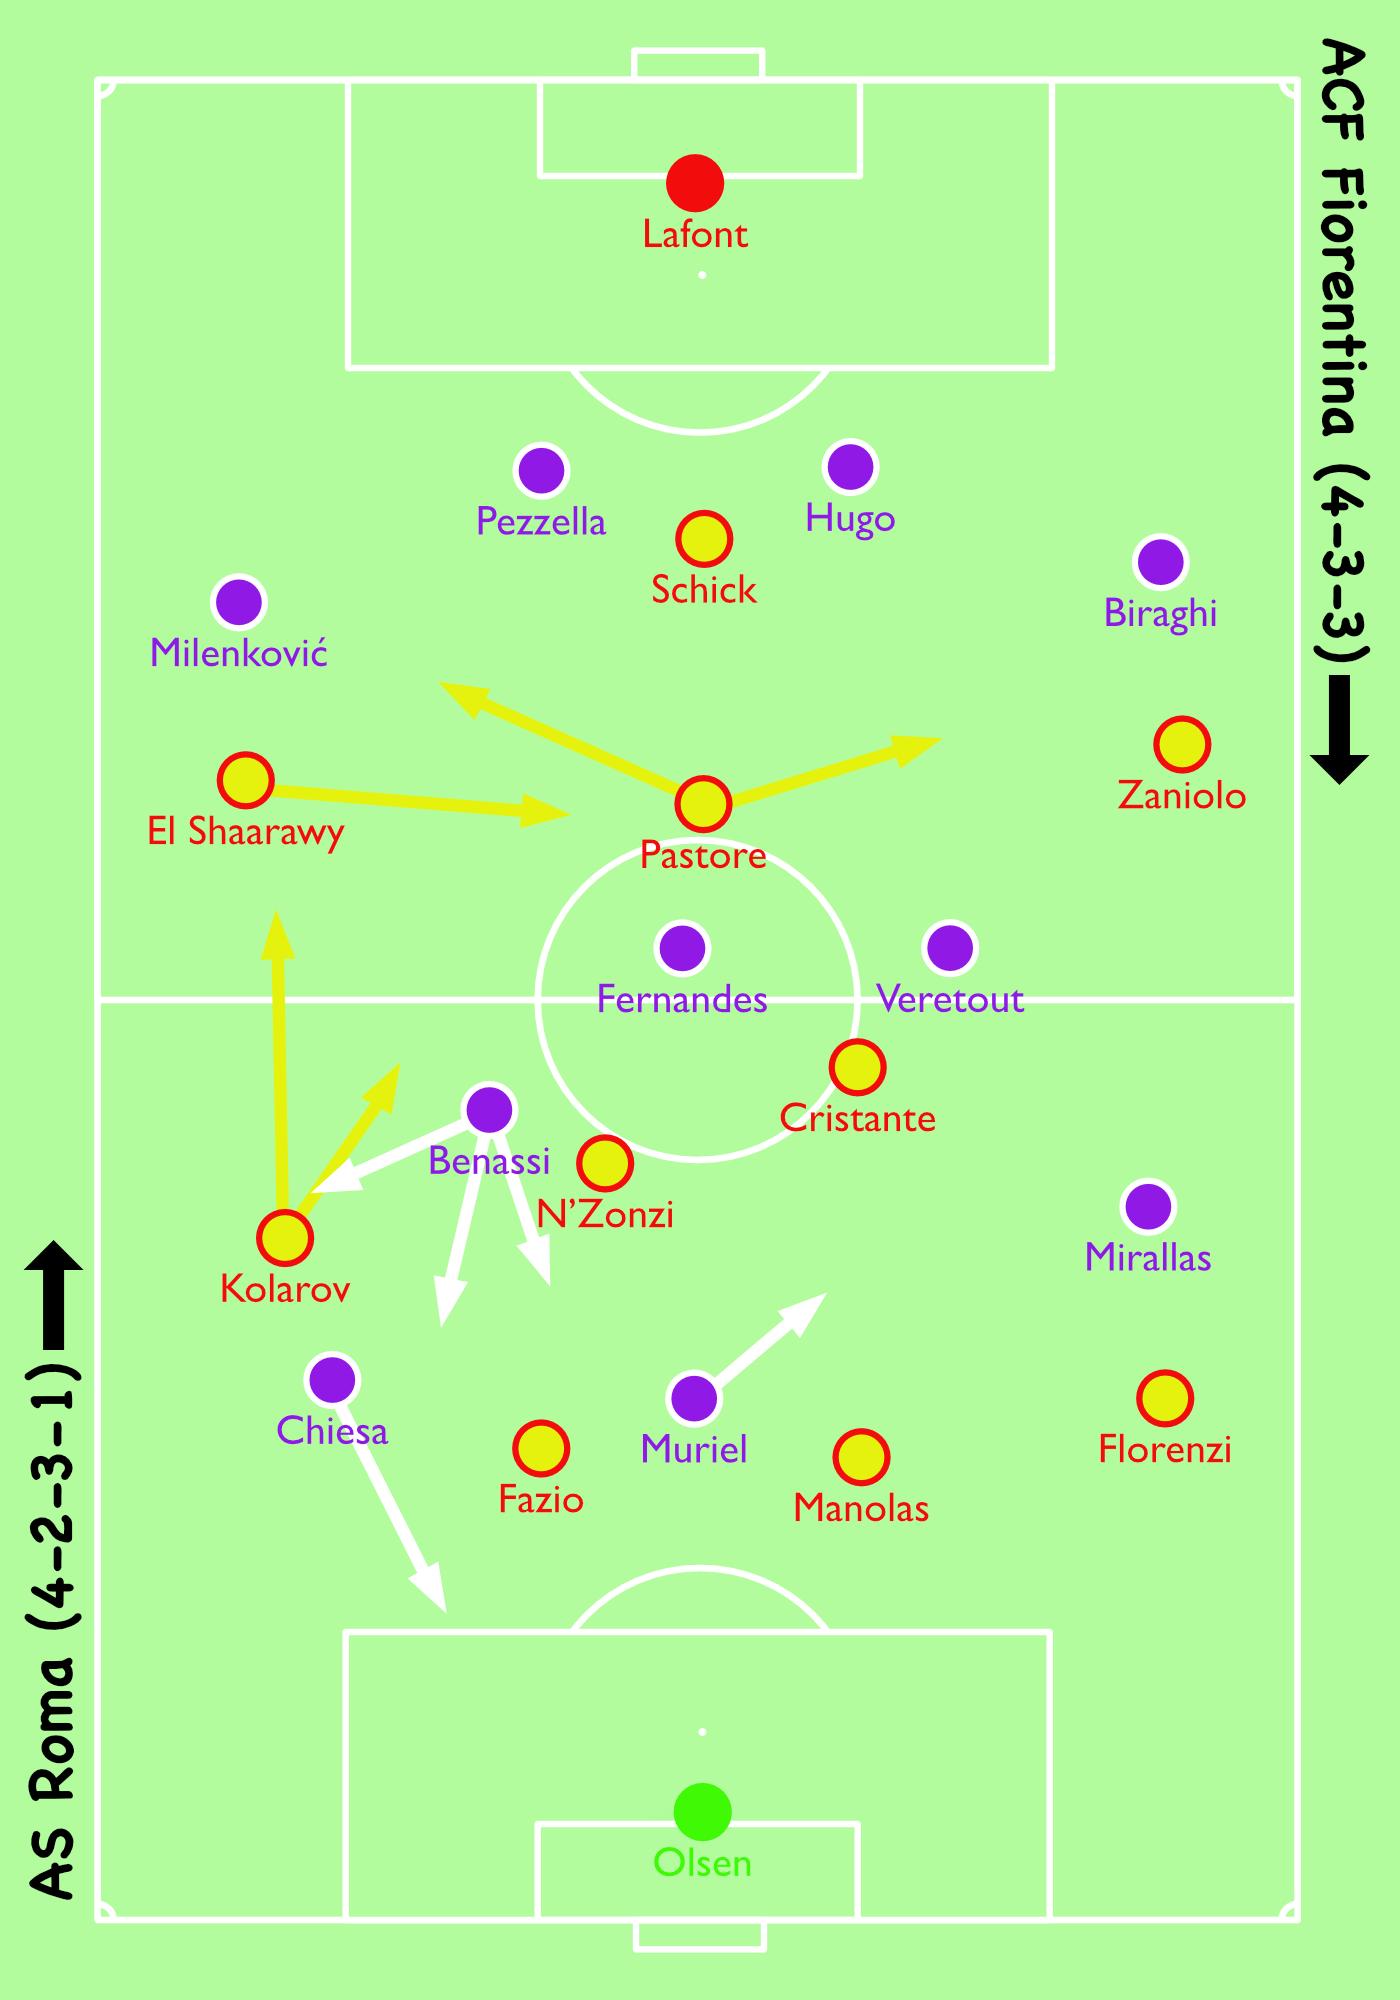 Coppa Italia 2018 19 Tactical Analysis Fiorentina Vs Roma